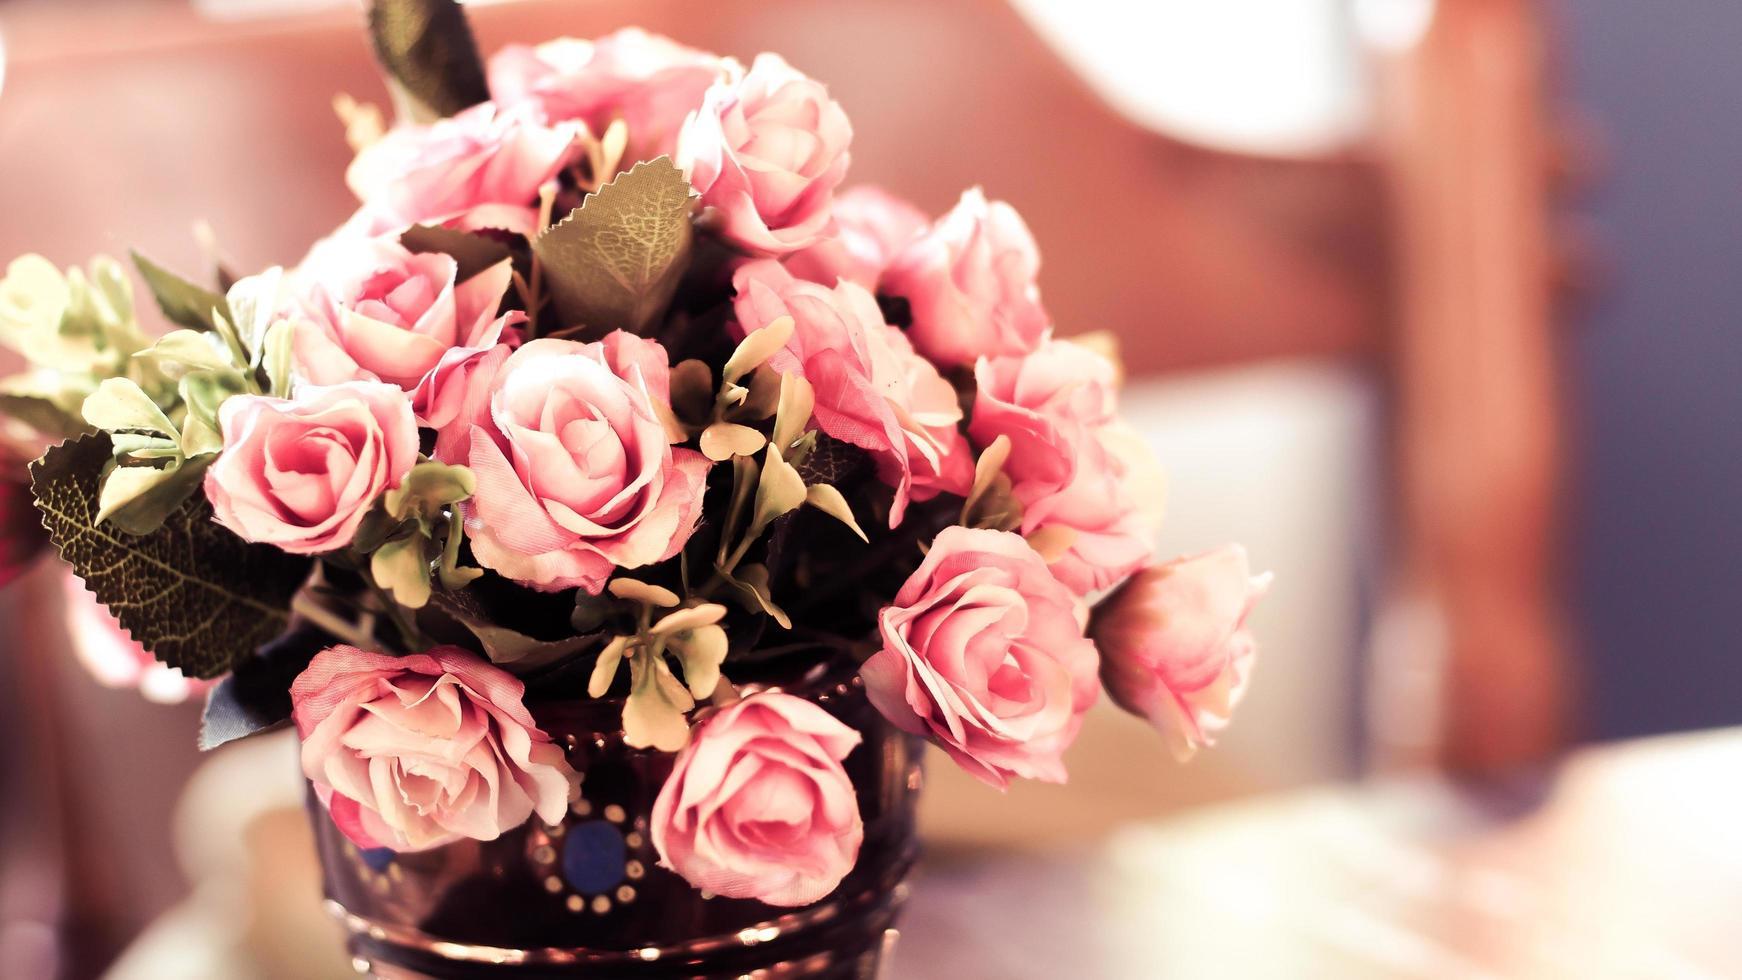 Close-up of pink floral arrangement photo